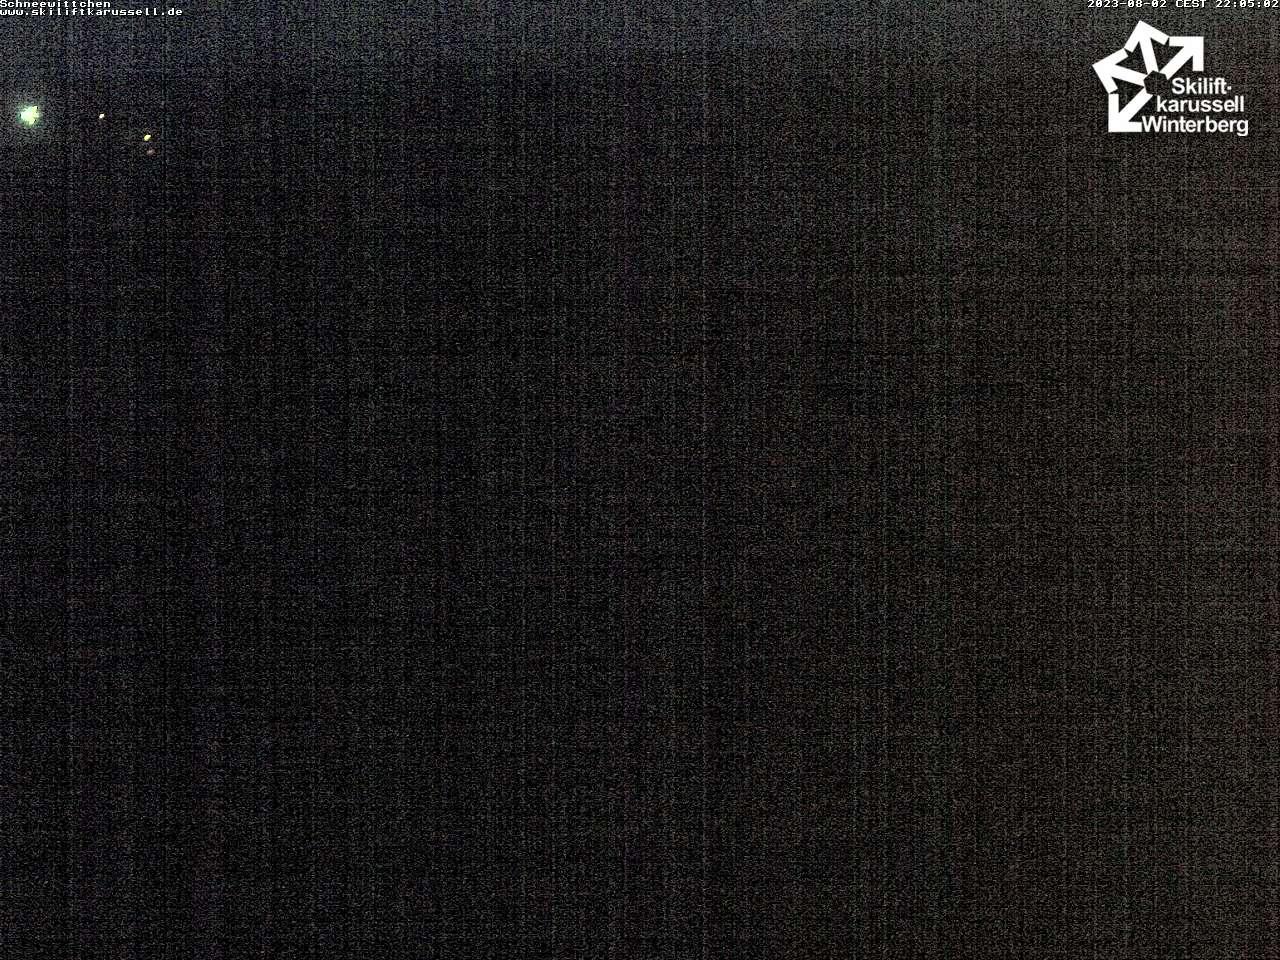 Webcam Schneewittchen - Skilifkarussell Winterberg